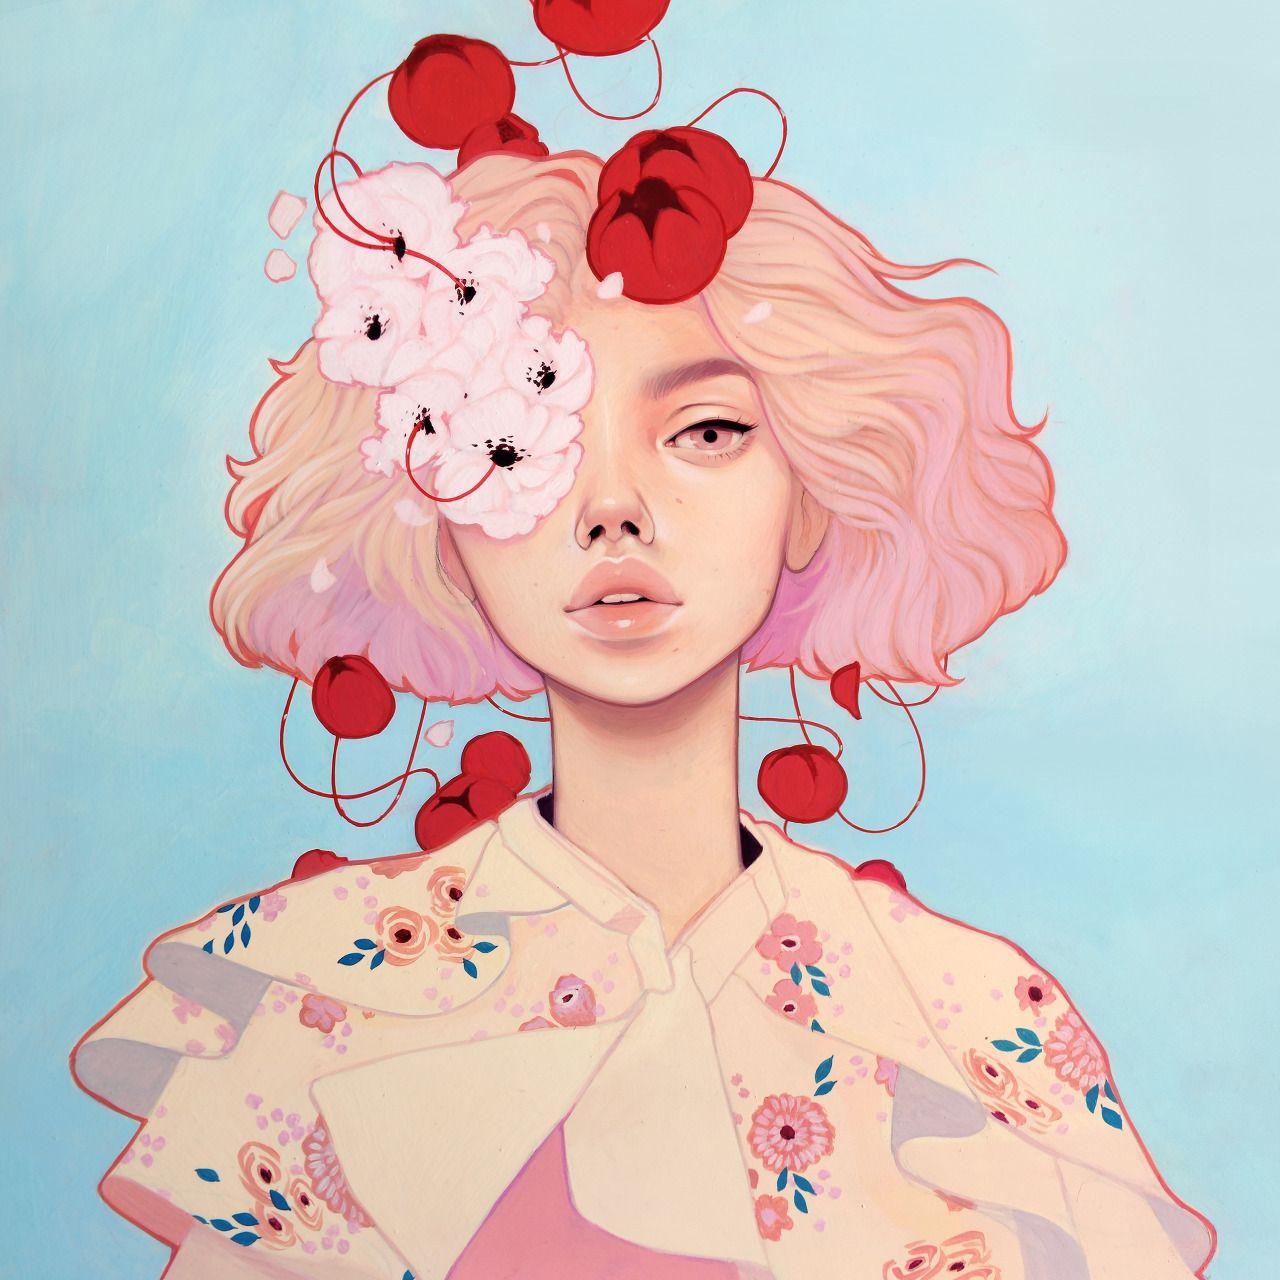 kelsey beckett illustrations draw arte ilustraciones arte digital